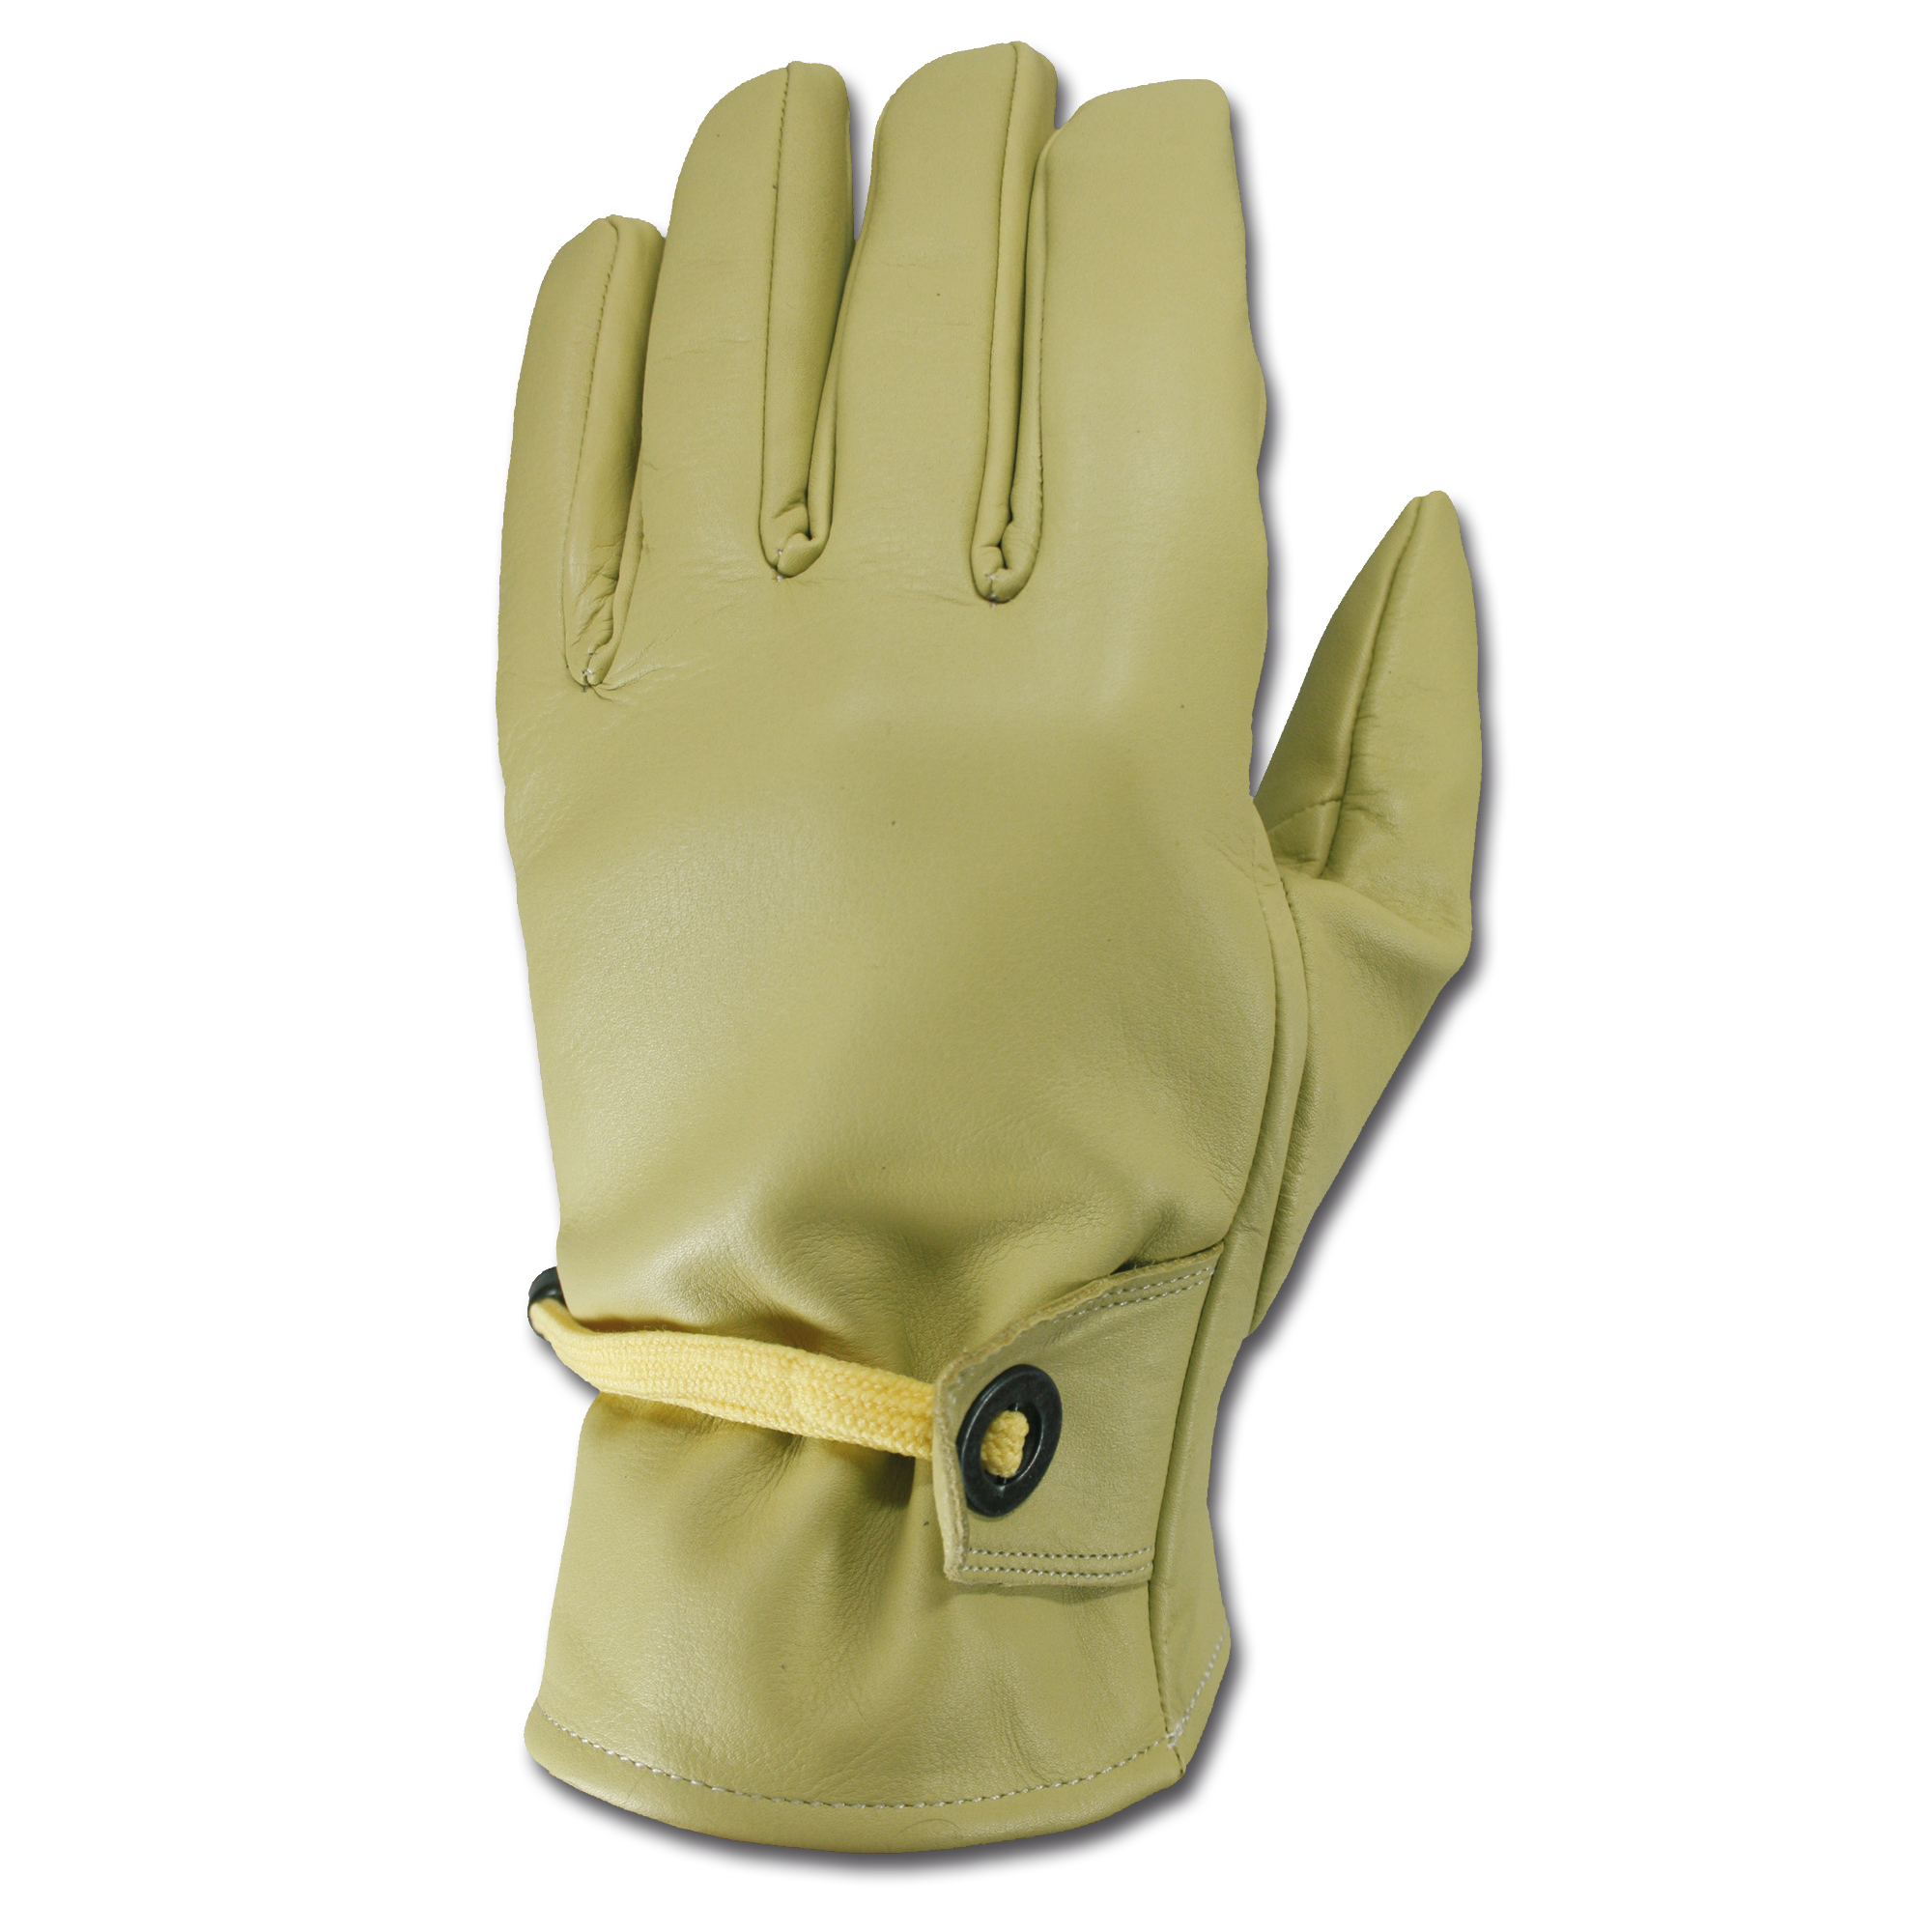 Western Gloves khaki